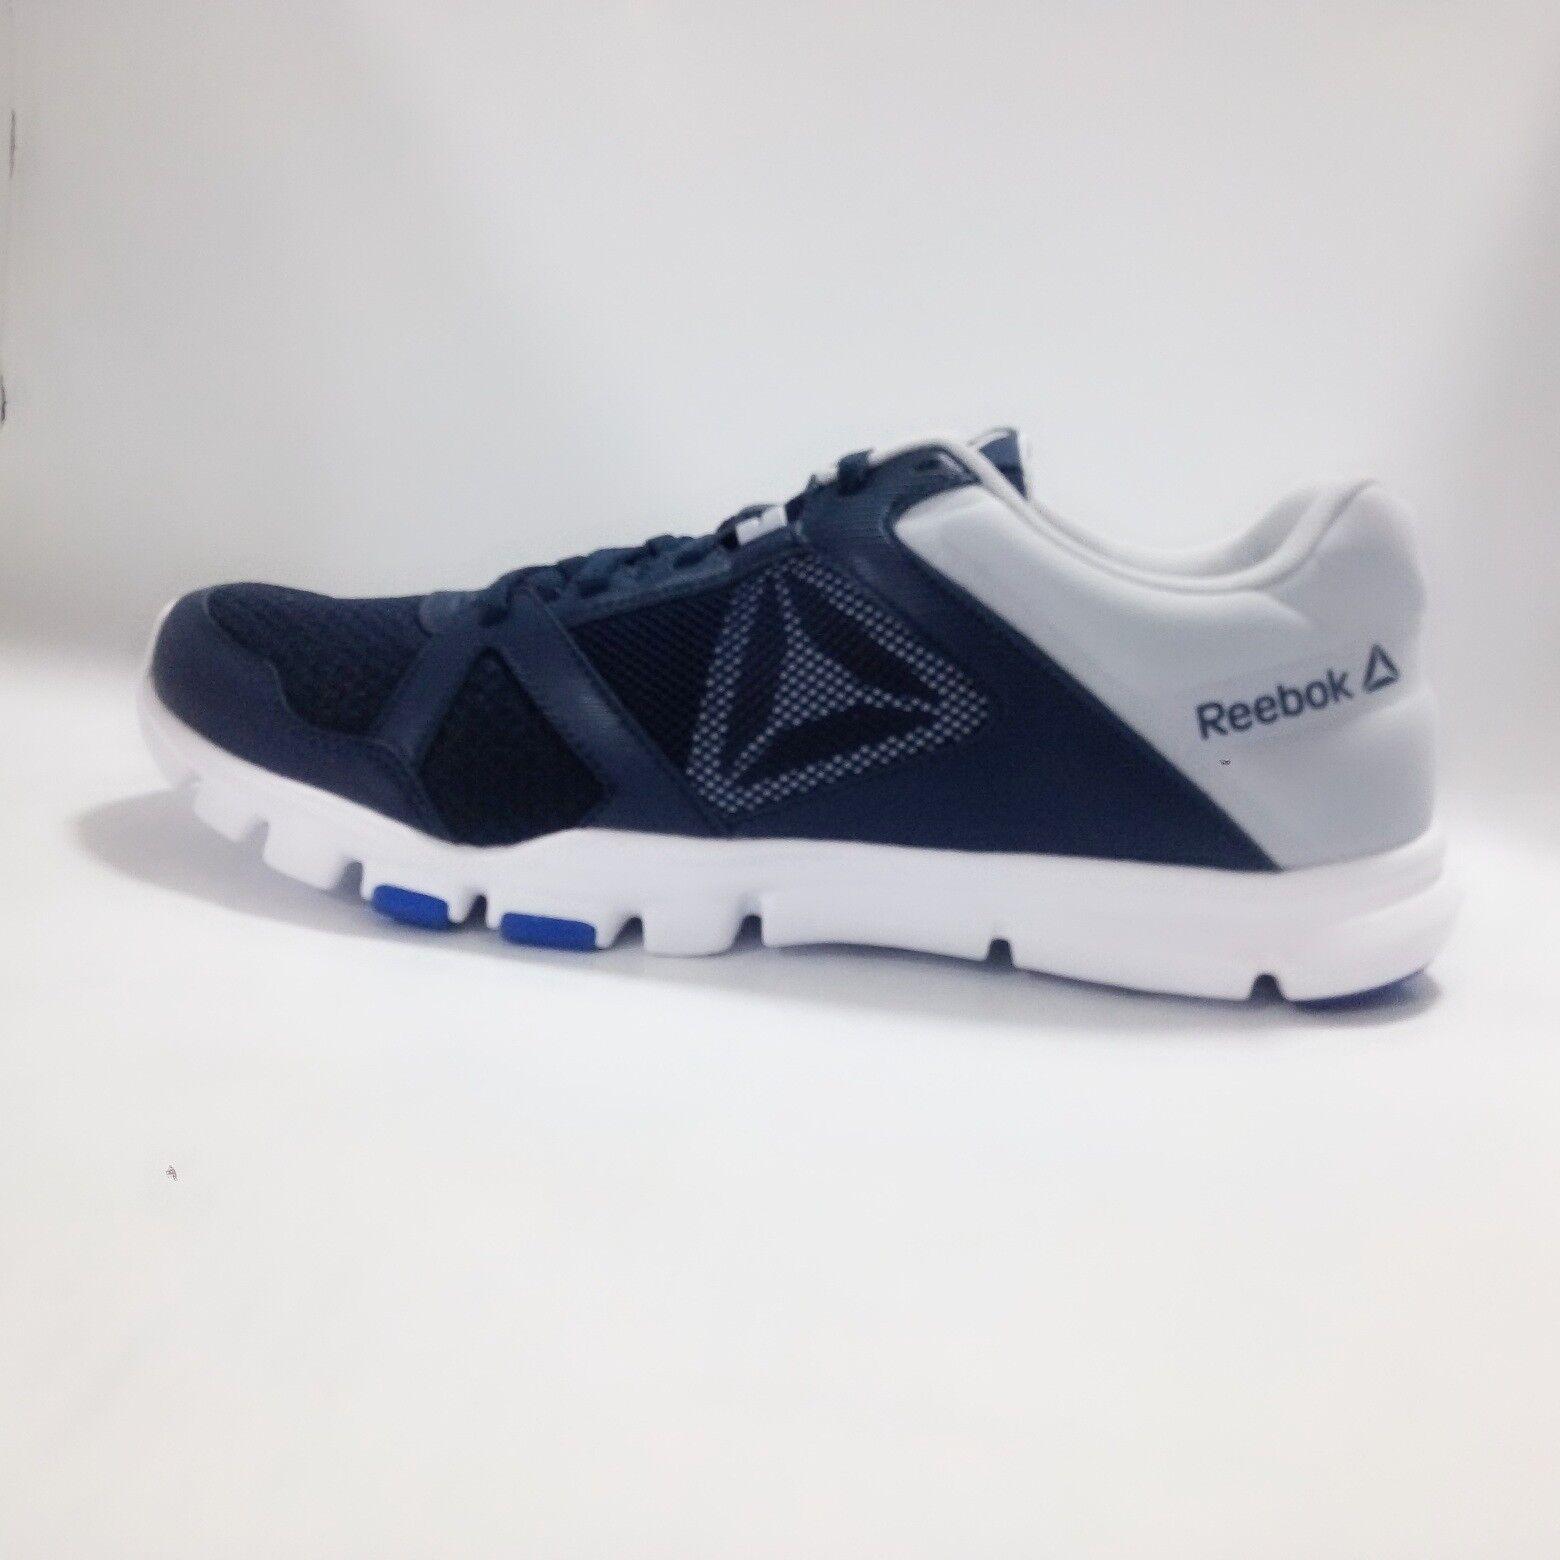 Mens reebok shoes-flexible, train 10-grey bluee-bs9999